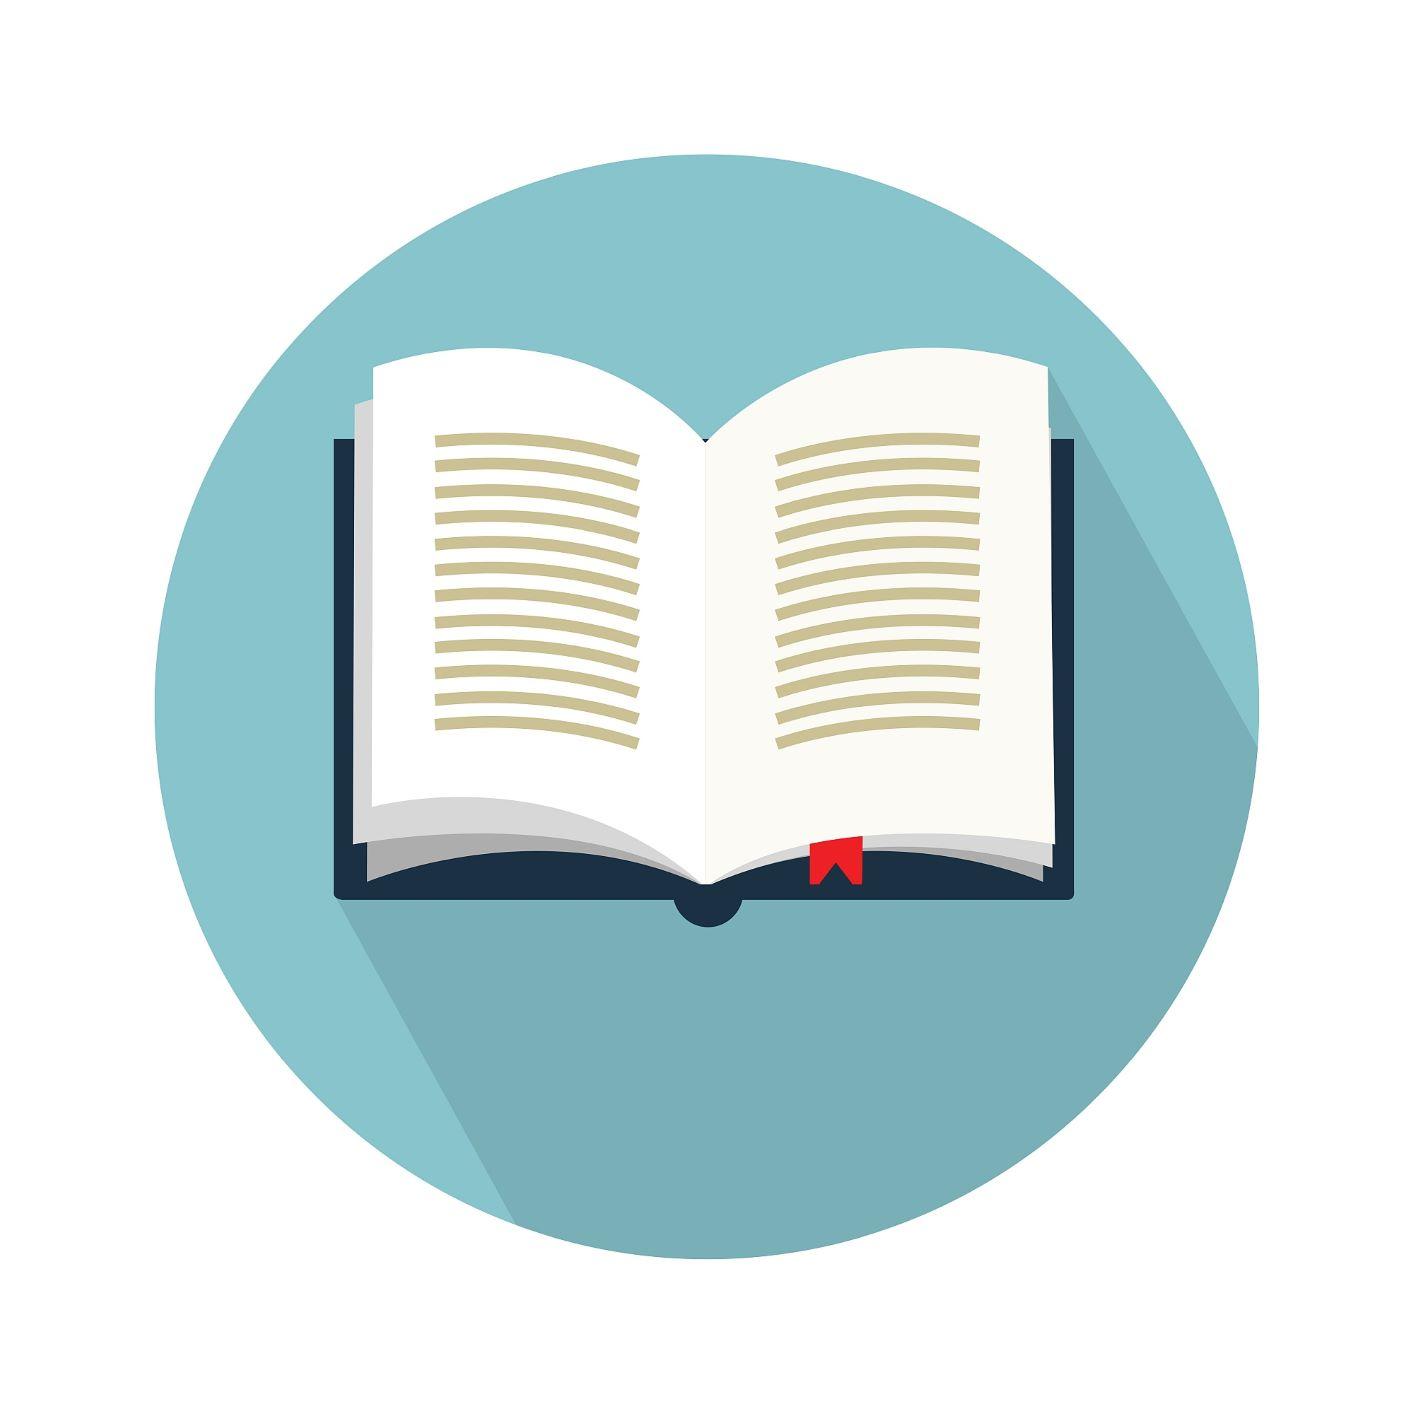 Kompendium gimnazjalisty Matematyka Fizyka Chemia